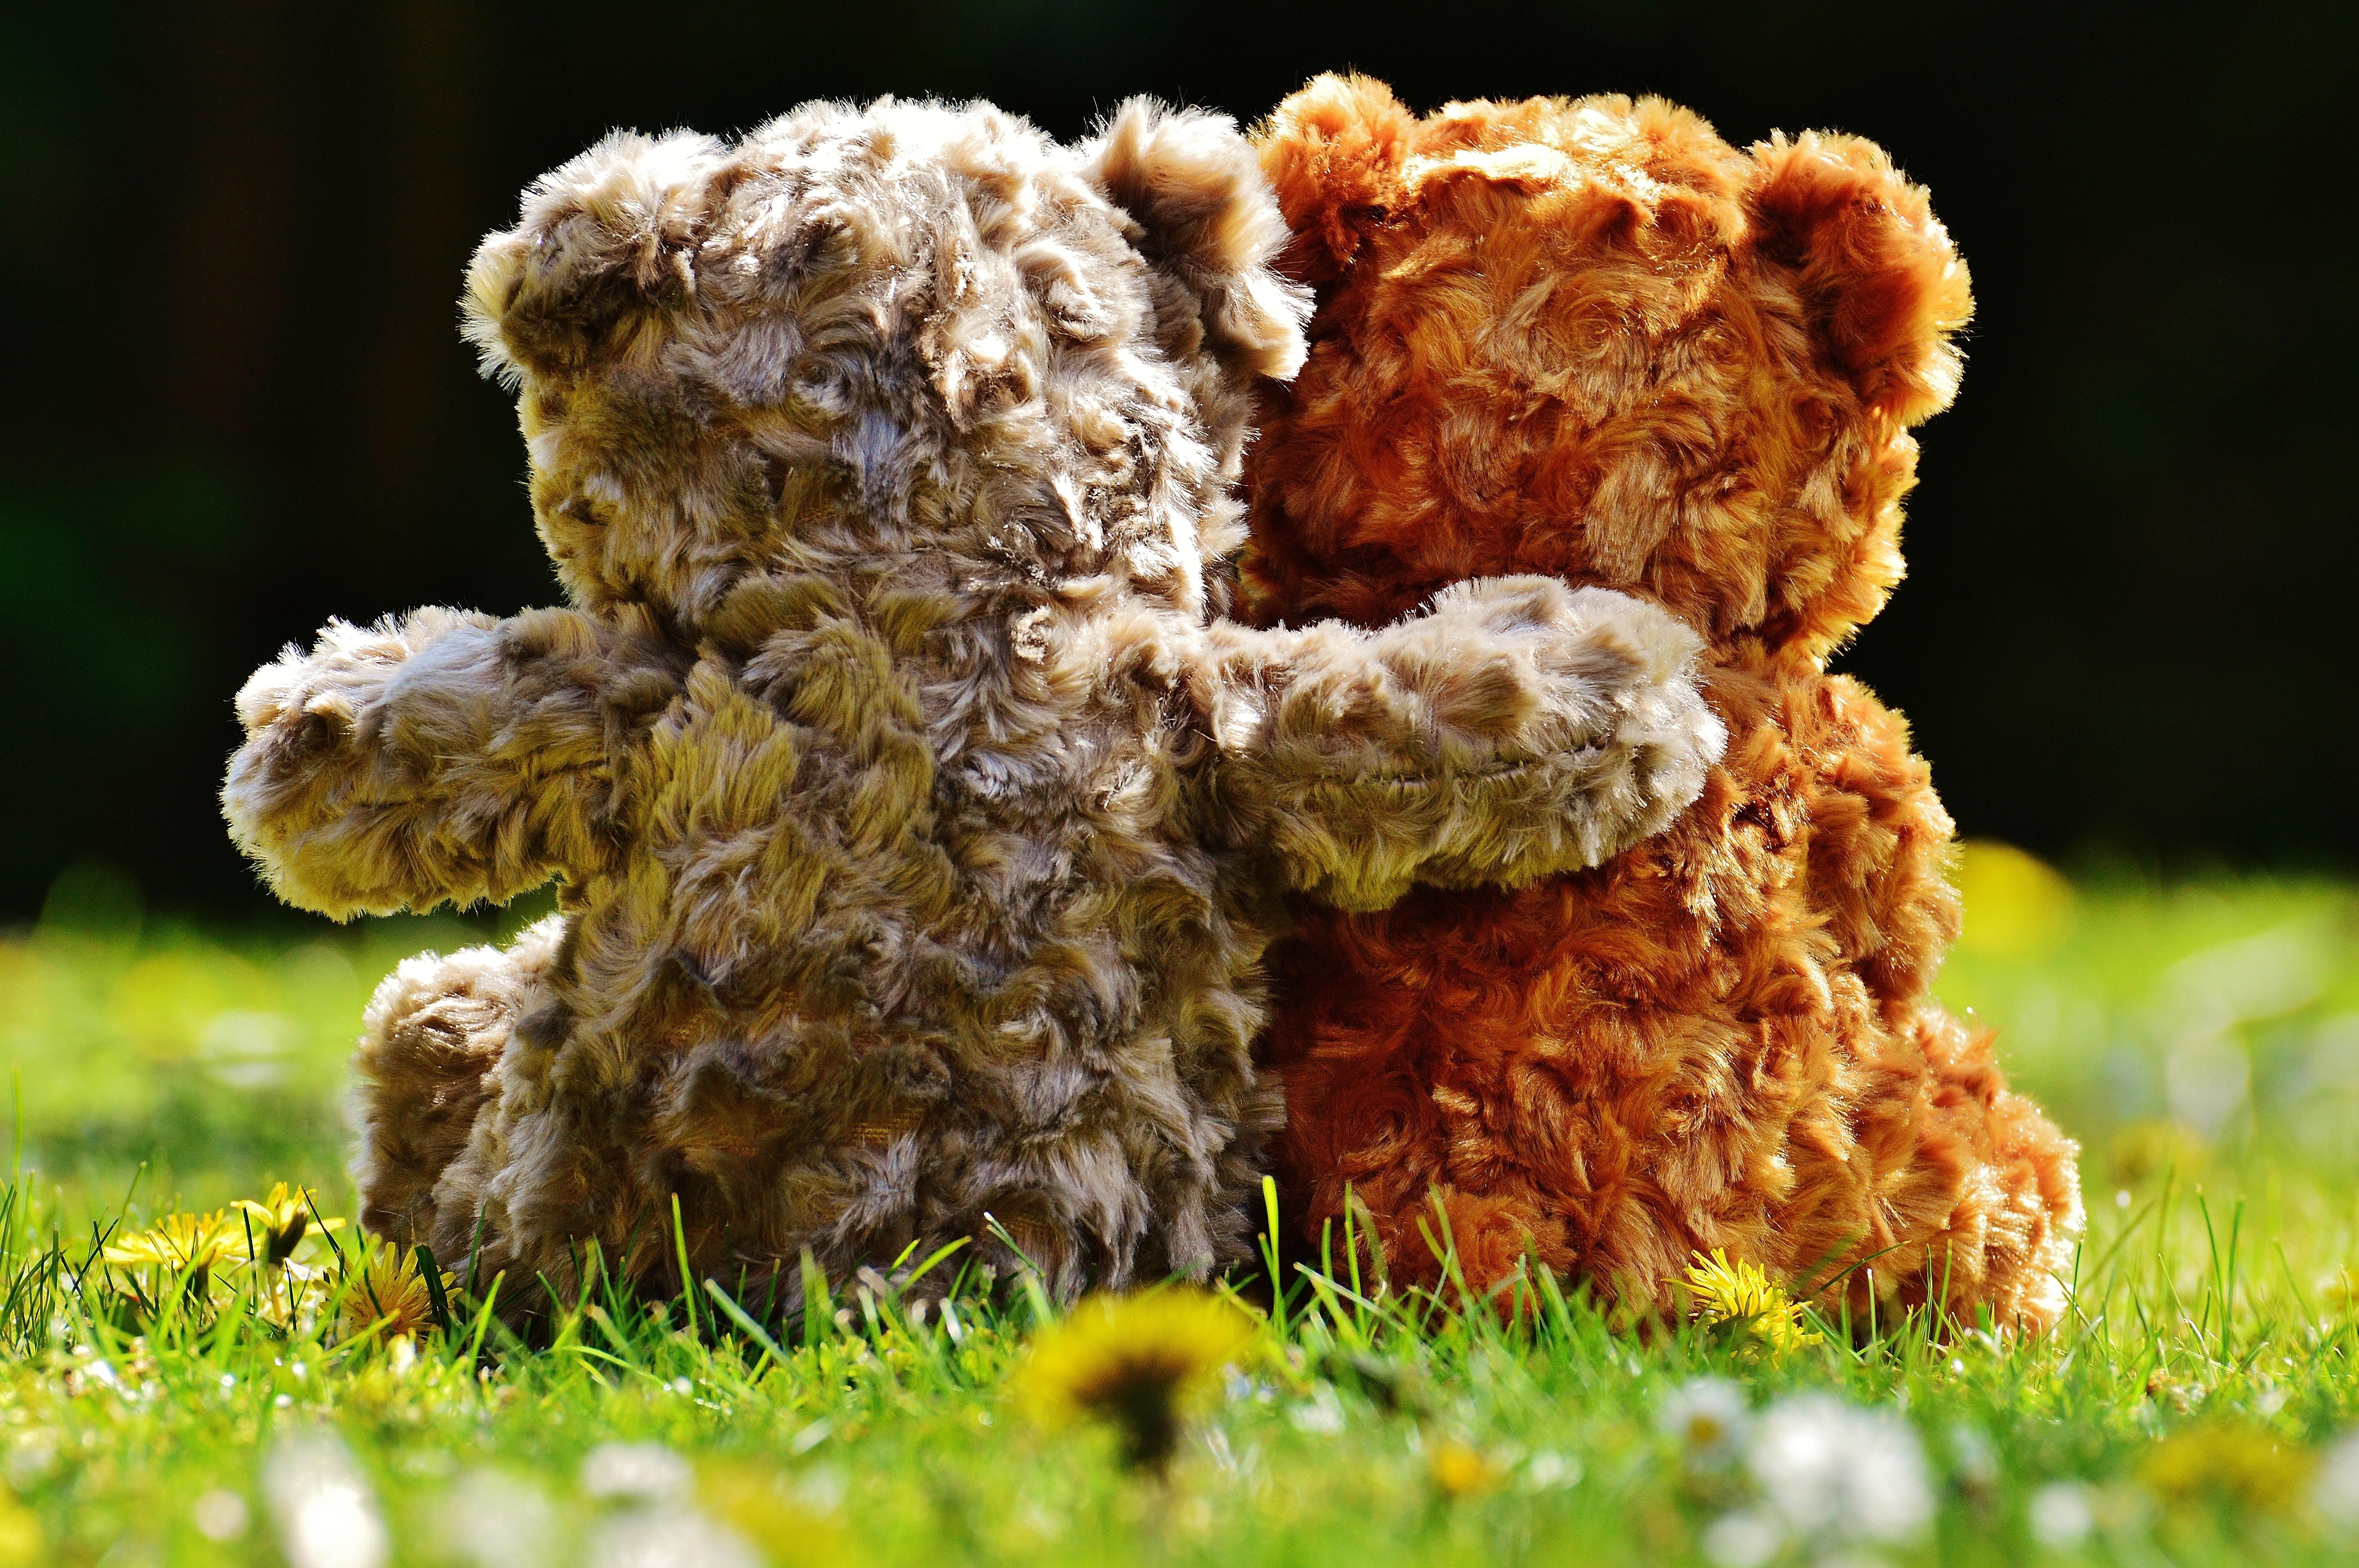 teddy-1361397